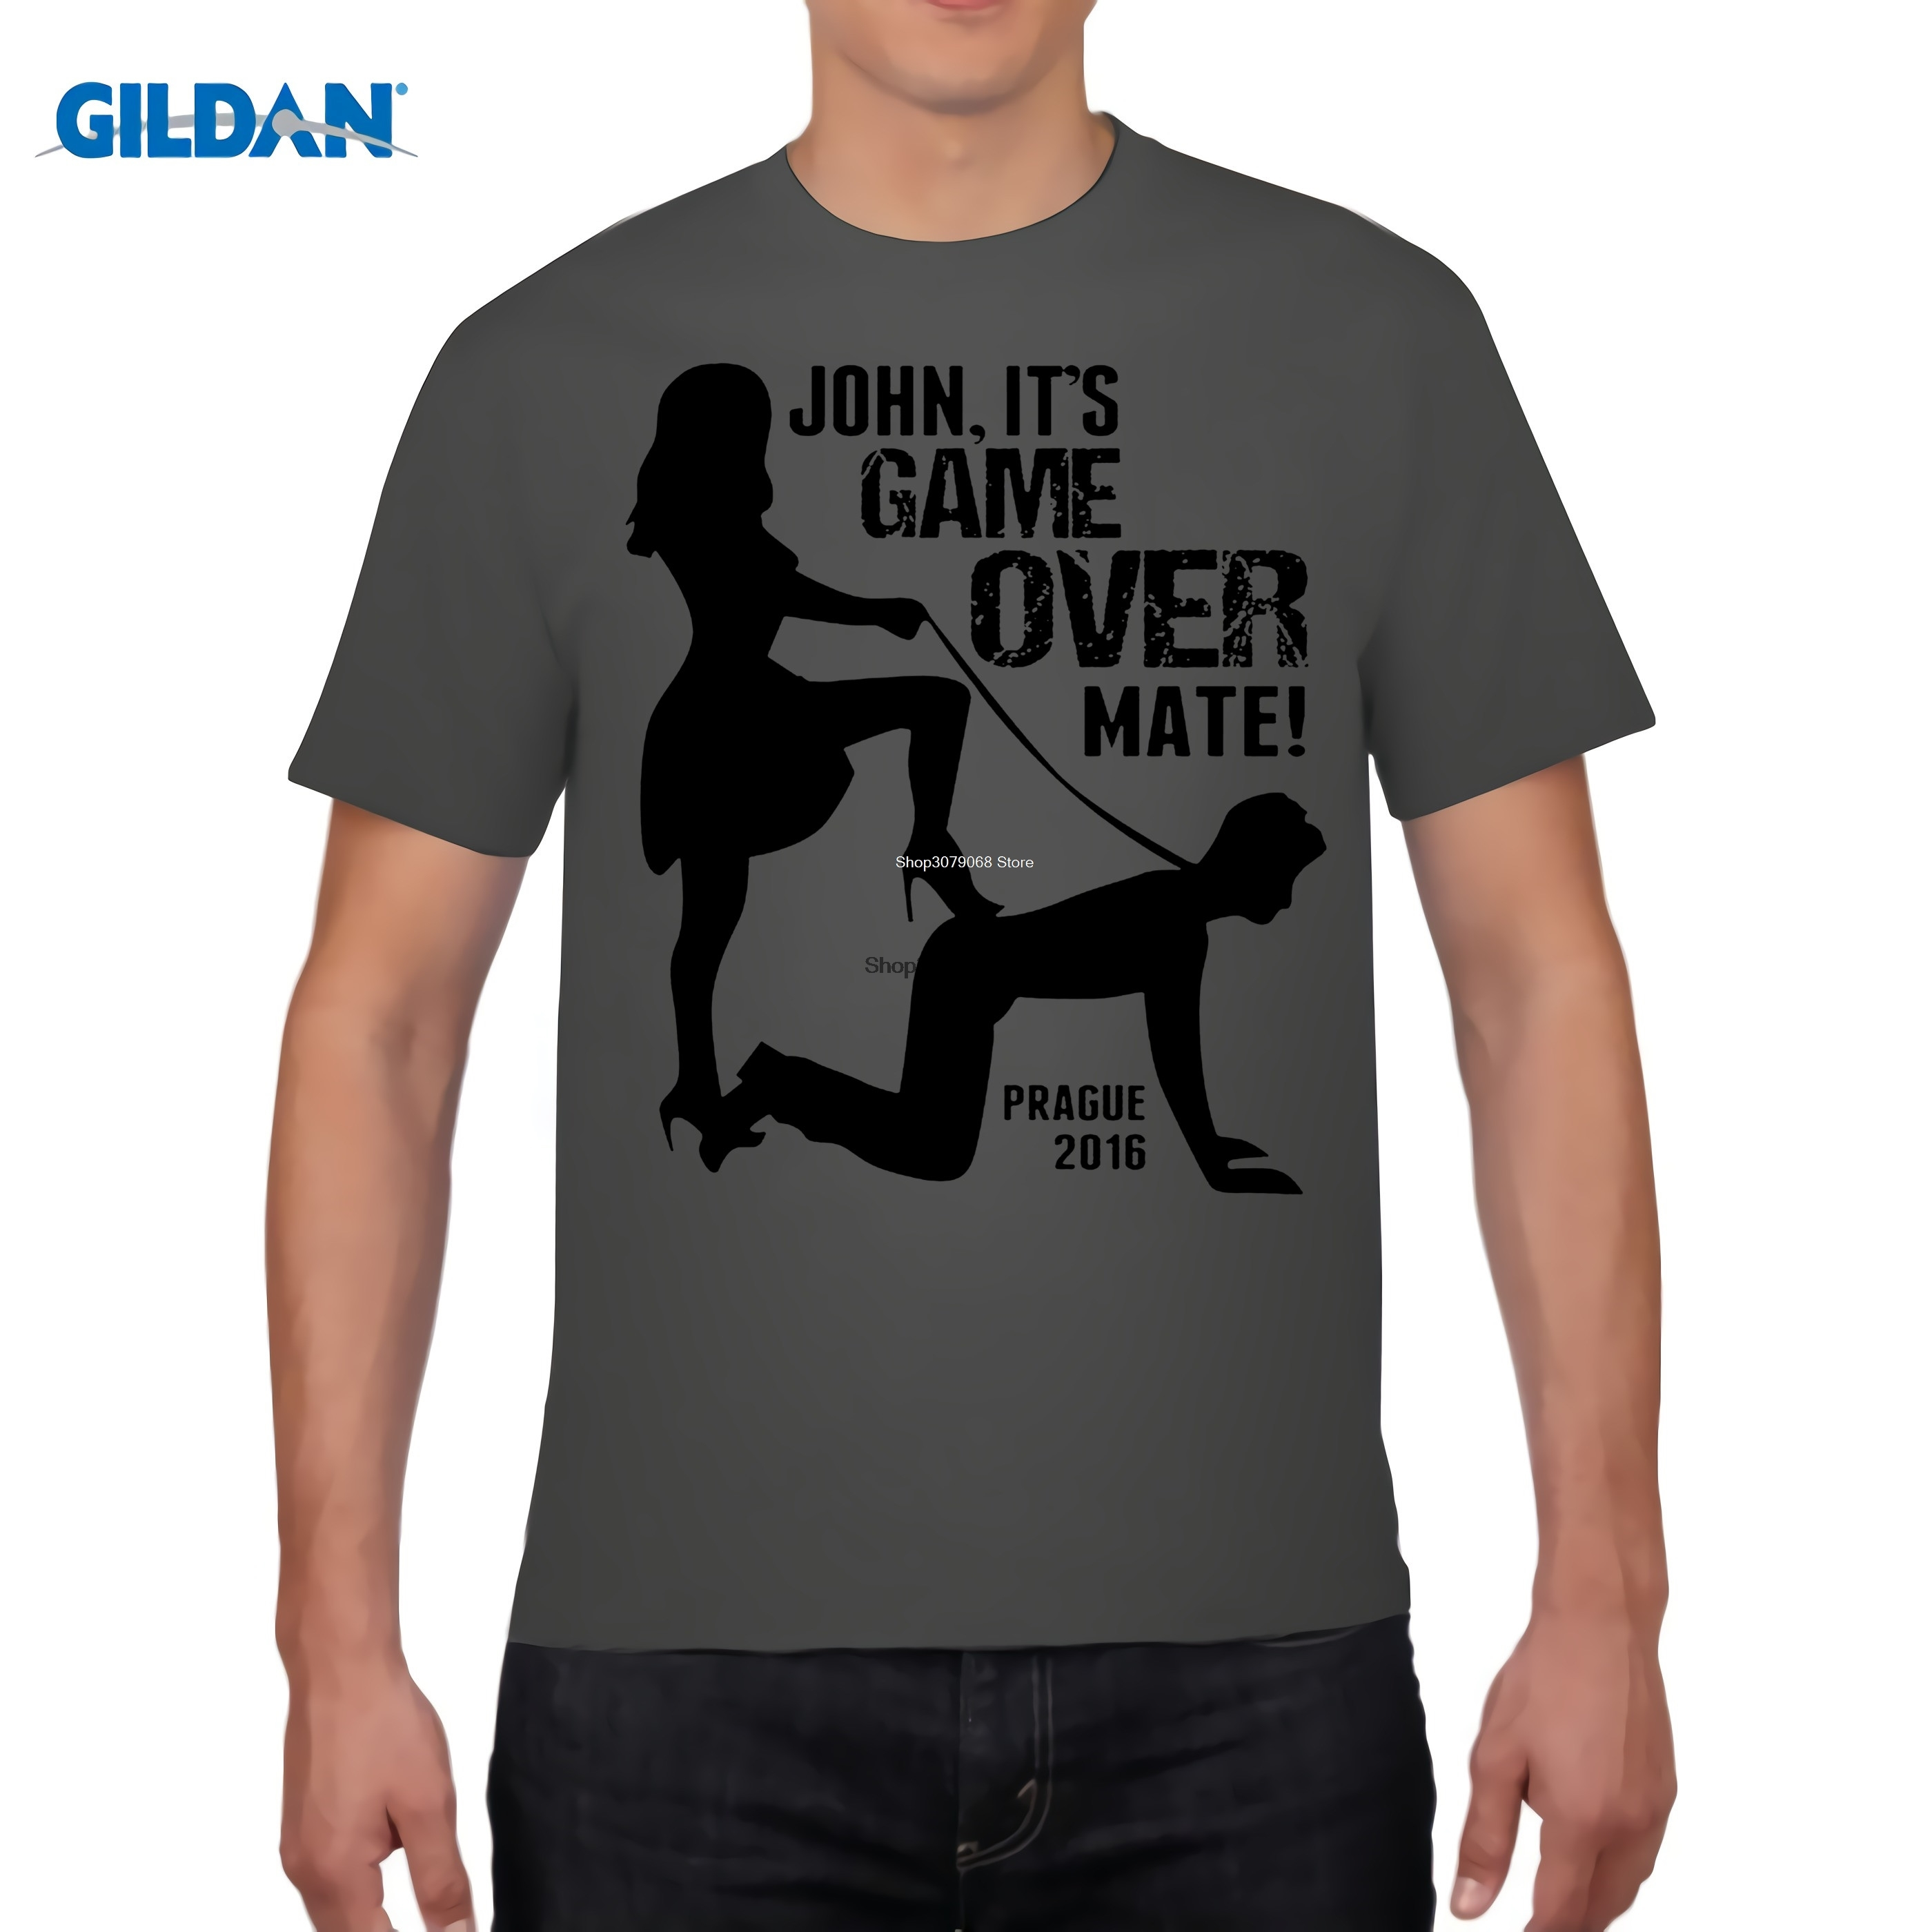 GILDAN designer t shirt 2017 New T-Shirt Woman Clothing Its Game Over Personalised Custom Stag Do Ladies Women Tee shirt